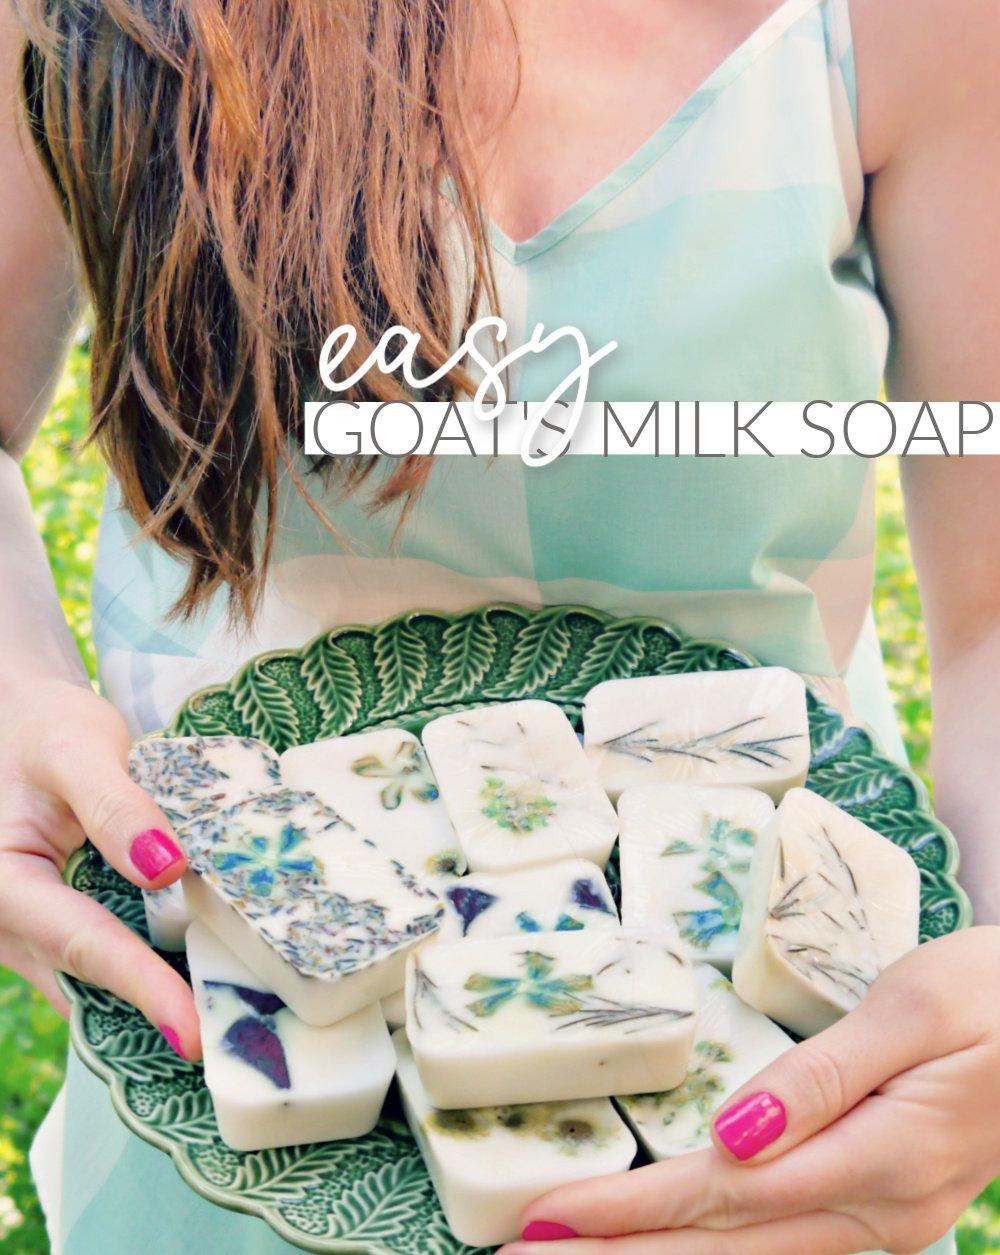 Easy DIY Goat's Milk Soap